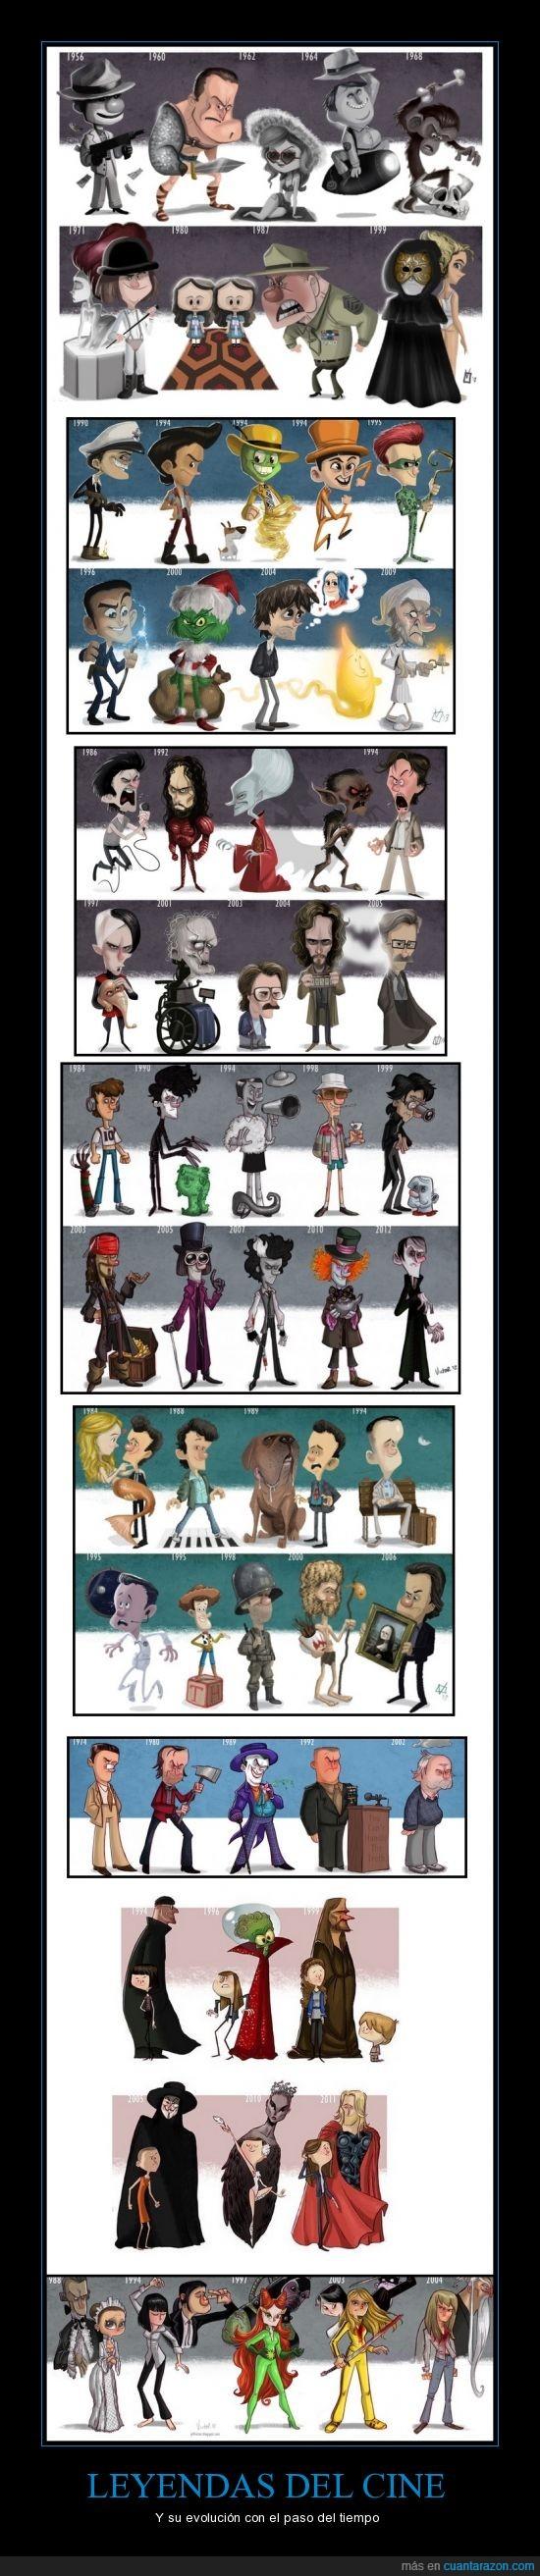 evolucion,Gary Oldman,Jack Nicholson,Jim Carrey,Johnny Depp,Natalie Portman,Stanley Kubrick,Tiempo,Tom Hanks,Uma Thurman